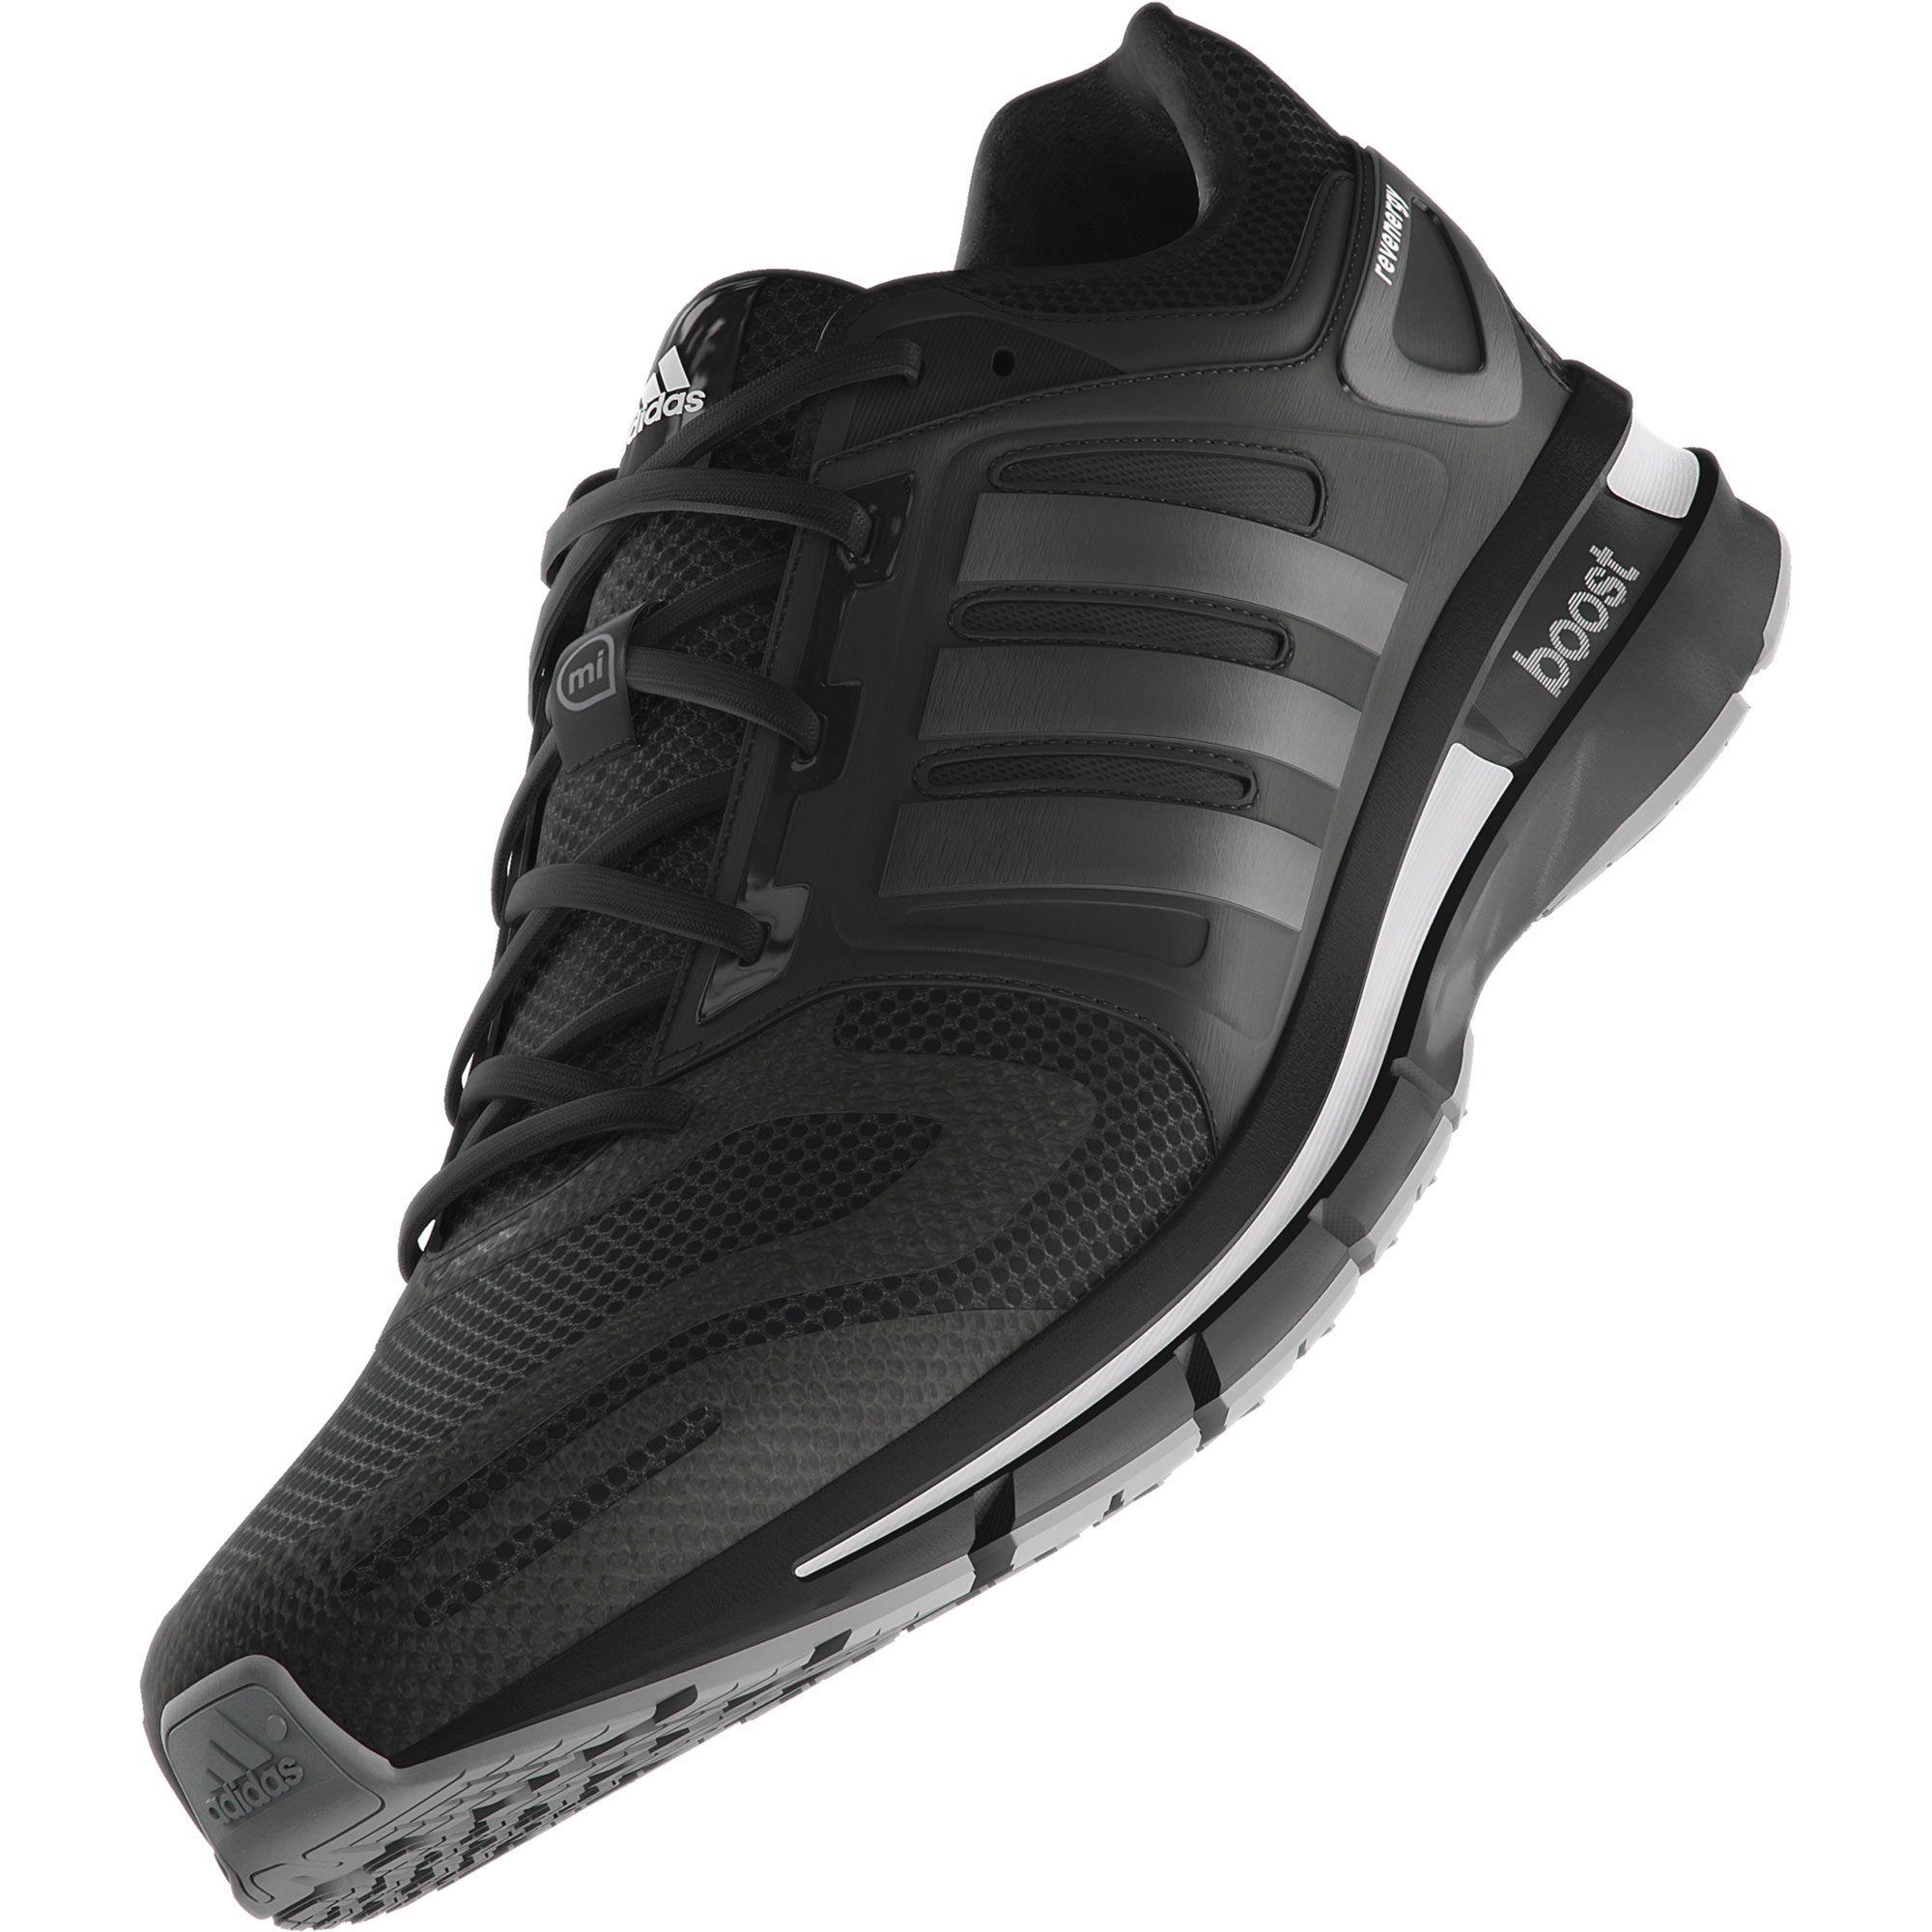 Adidas revenergy impulso scarpe adidas pinterest aumentare le scarpe